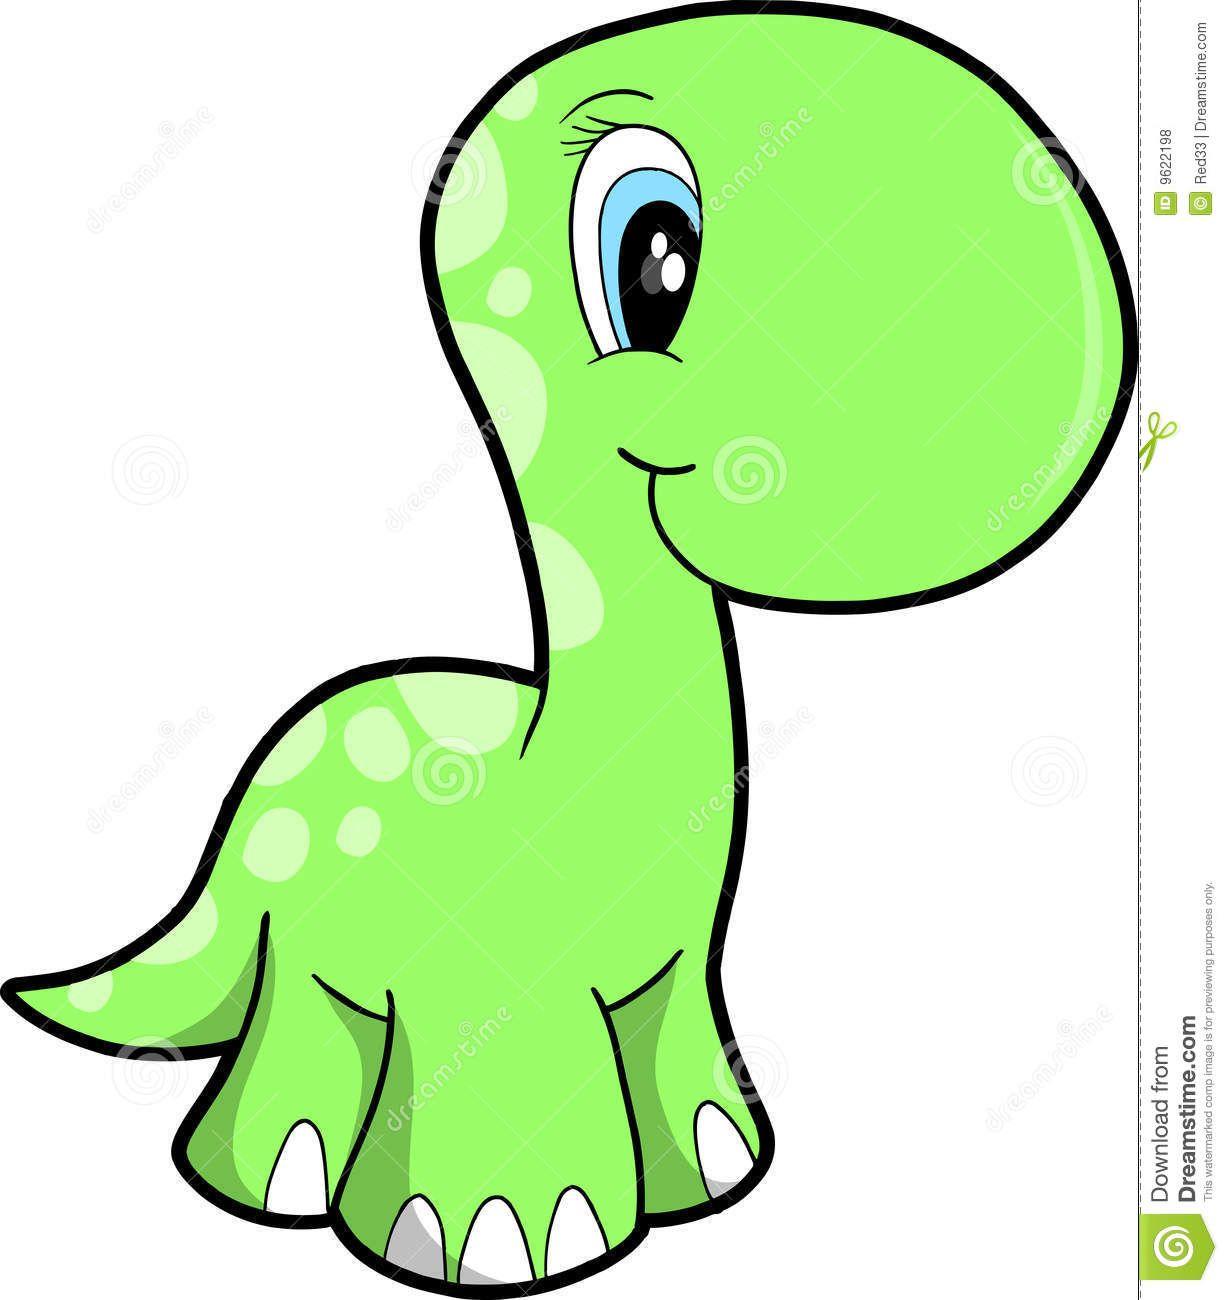 Cute Dinosaur Clipart Cute Vector Dinosaur Royalty Cute Dinosaur